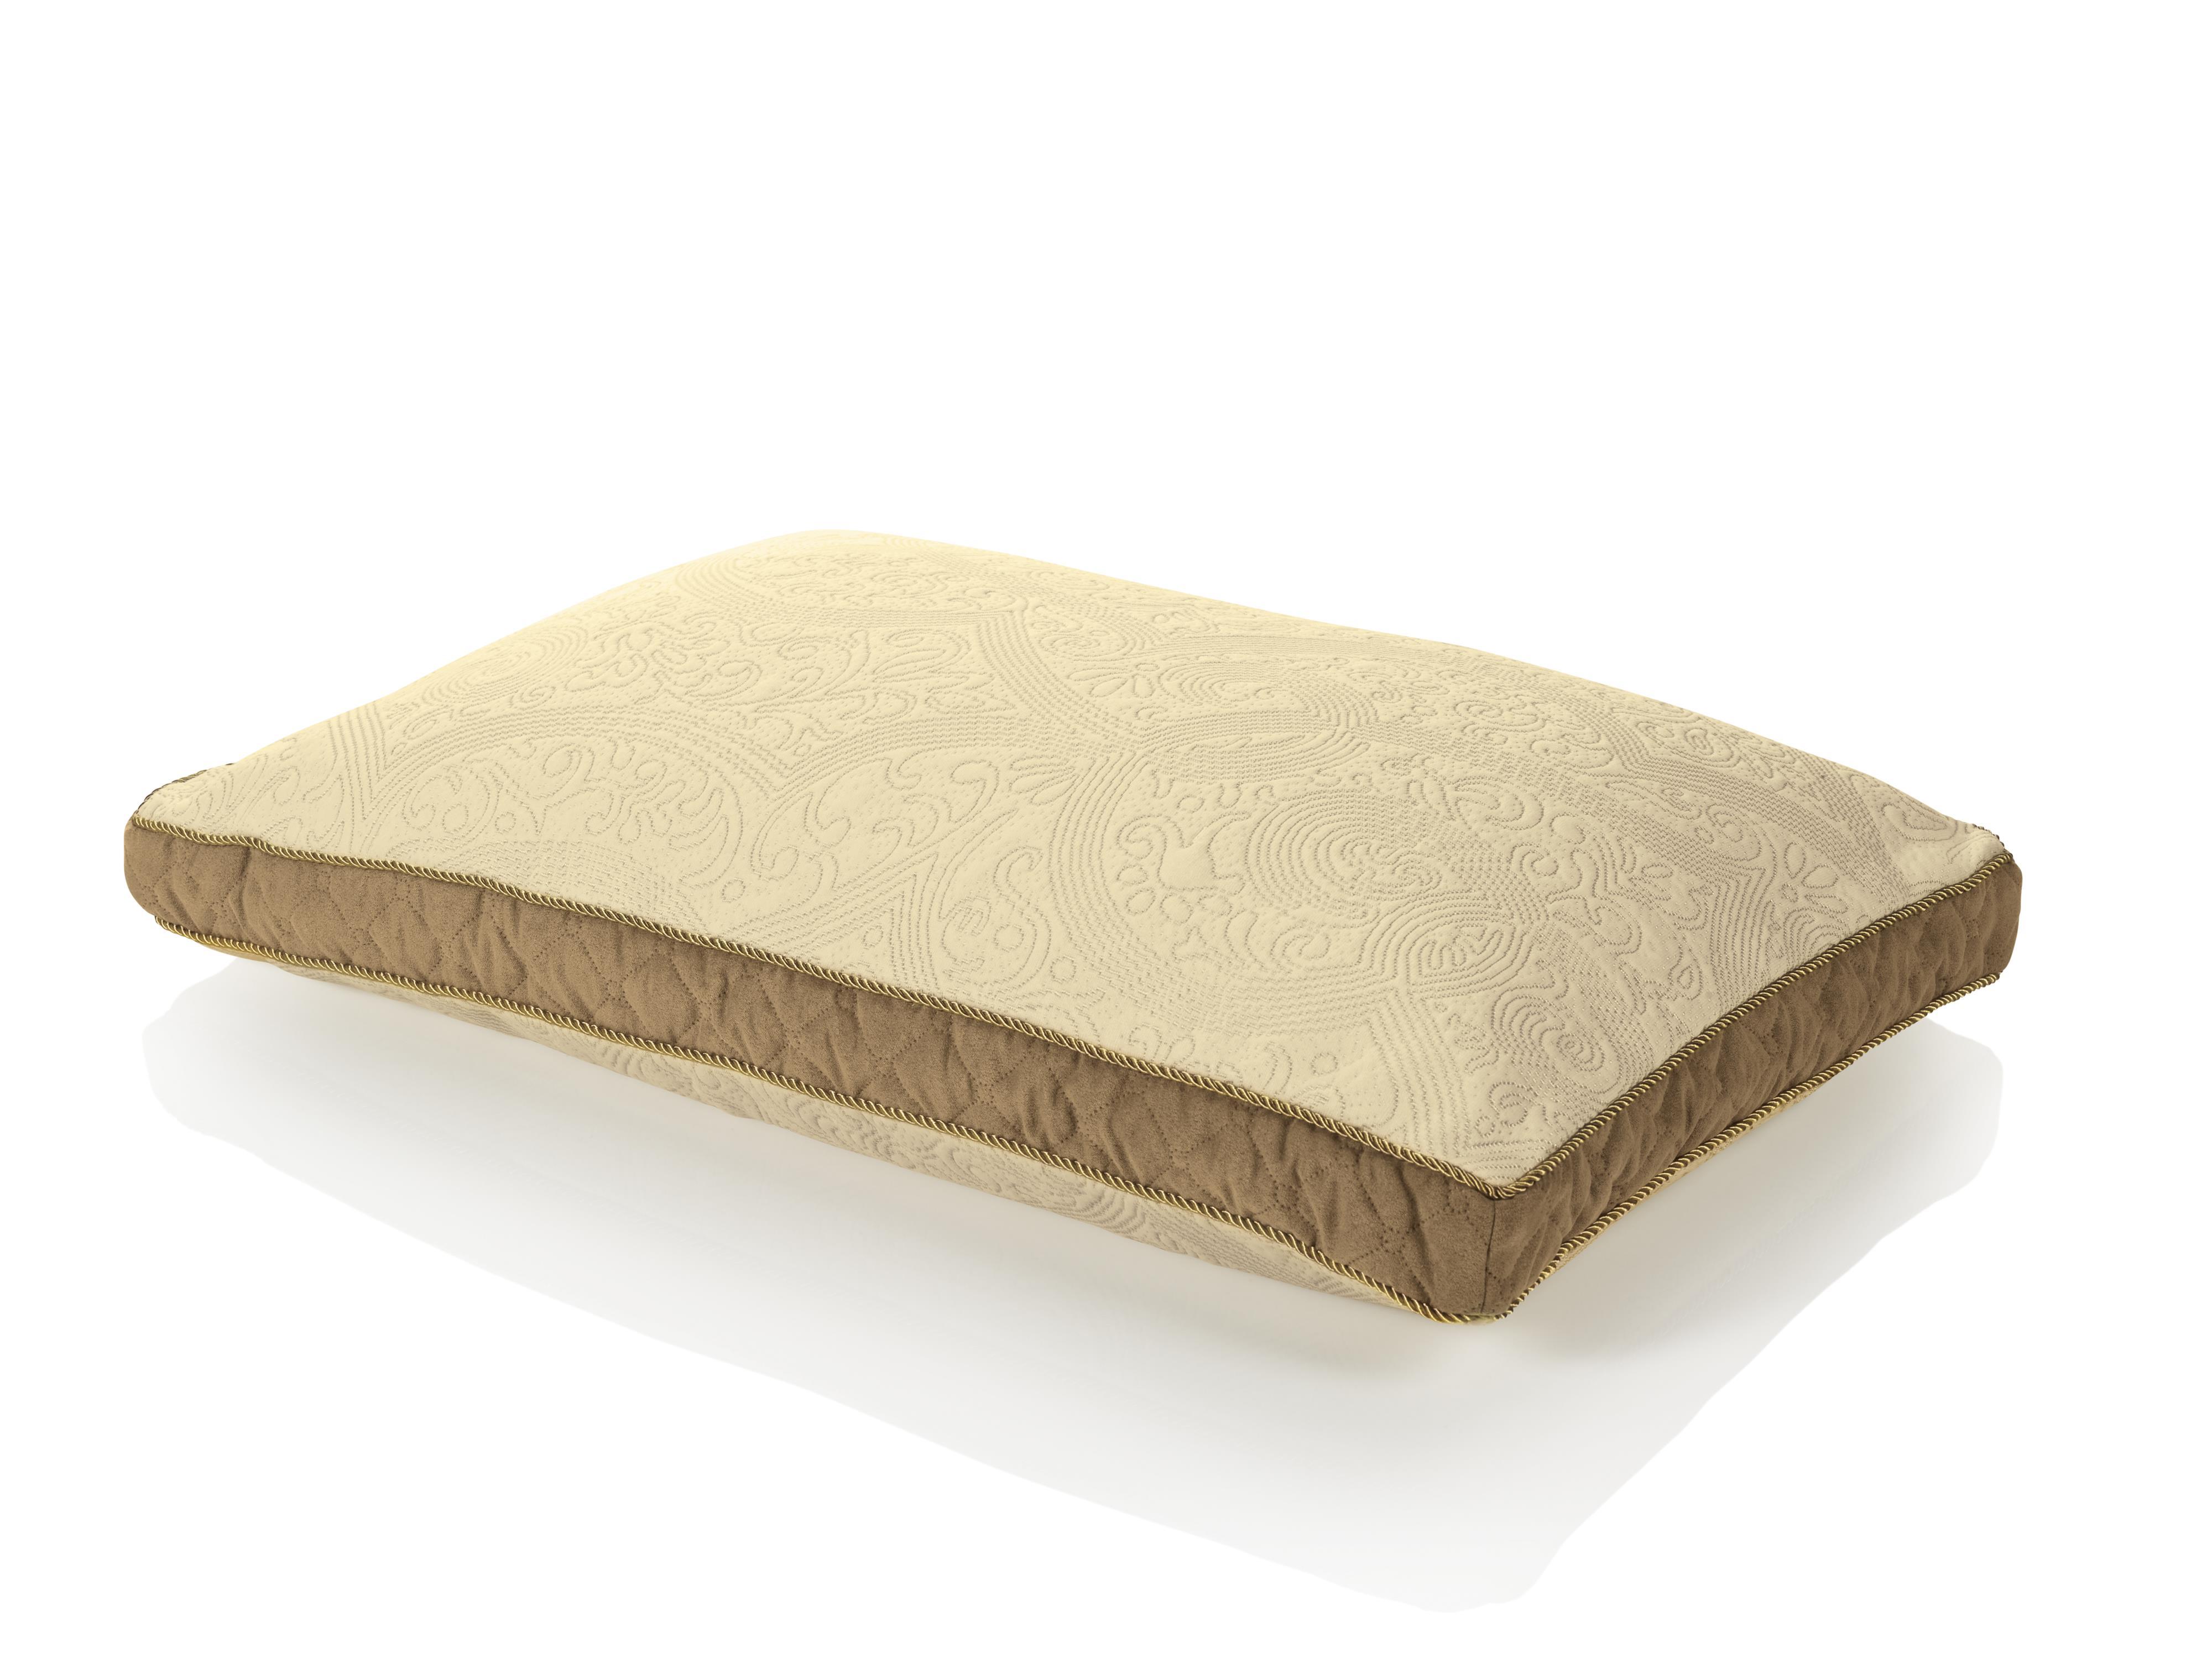 Tempur-Pedic® Tempur Pillows Queen The Grand Pillow by Tempur-Pedic - Item Number: 15185250